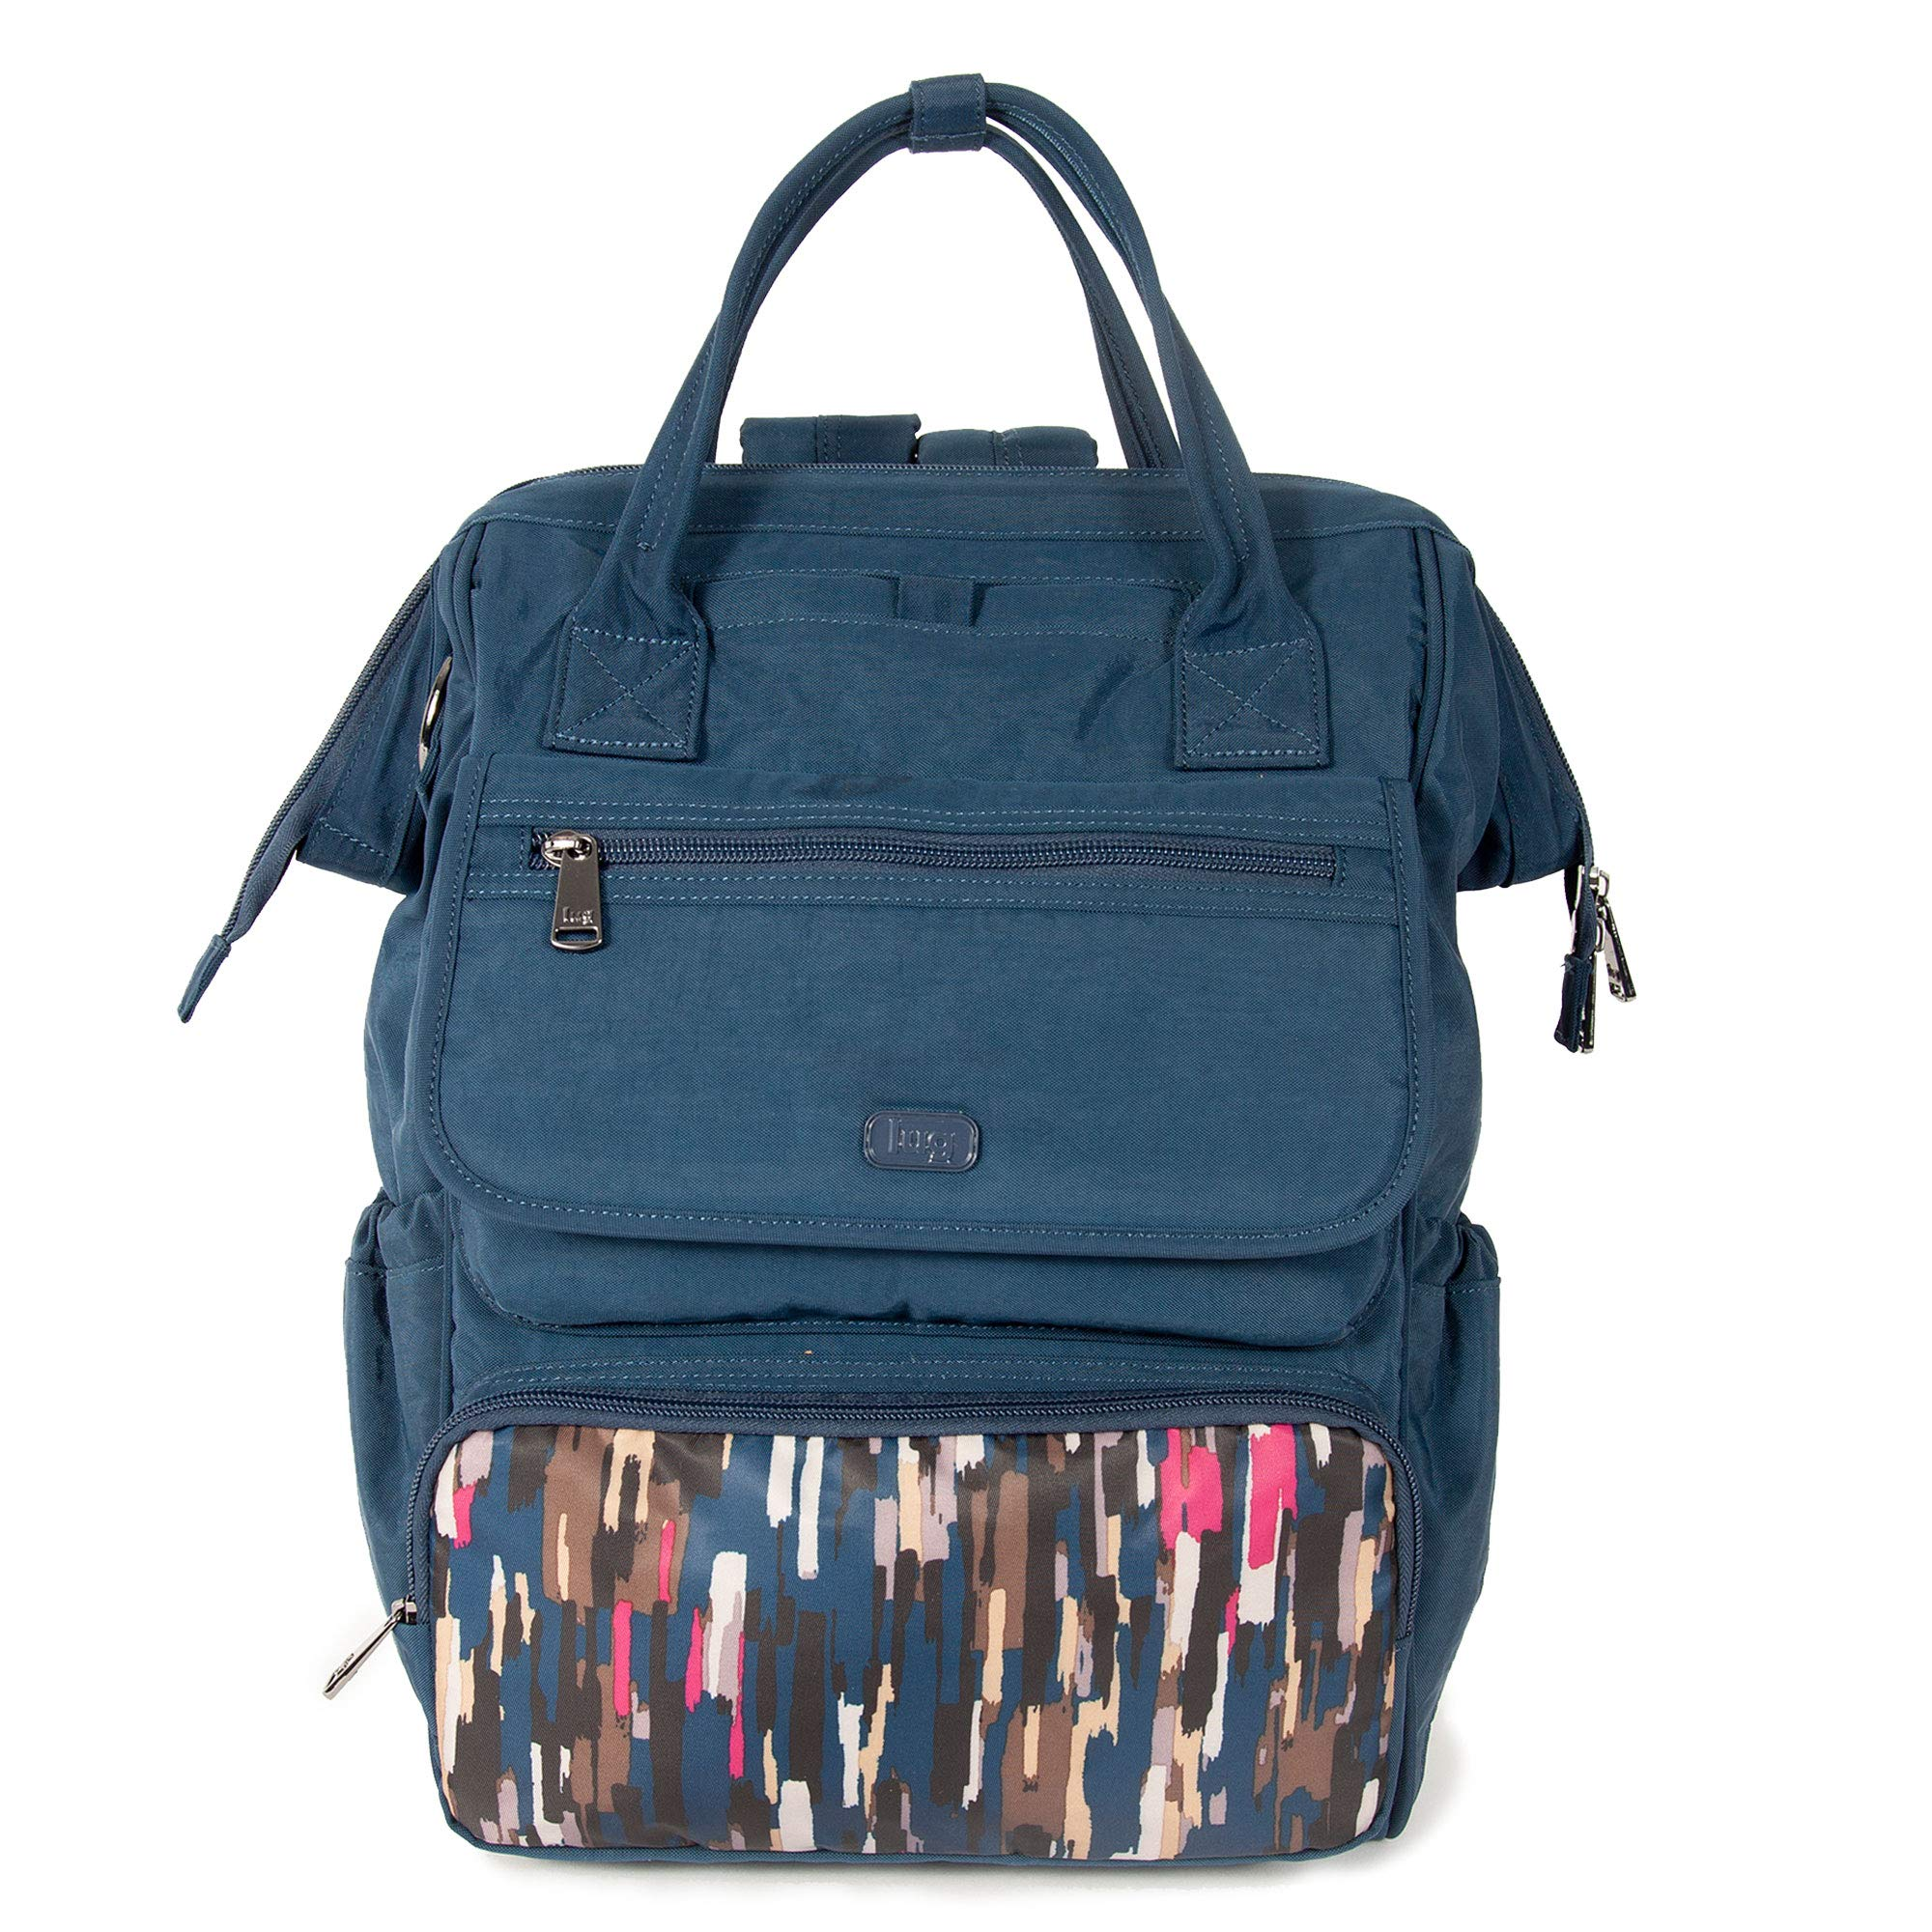 Lug Women's Via Convertible Tote, Riverwalk Navy Shoulder Bag One Size